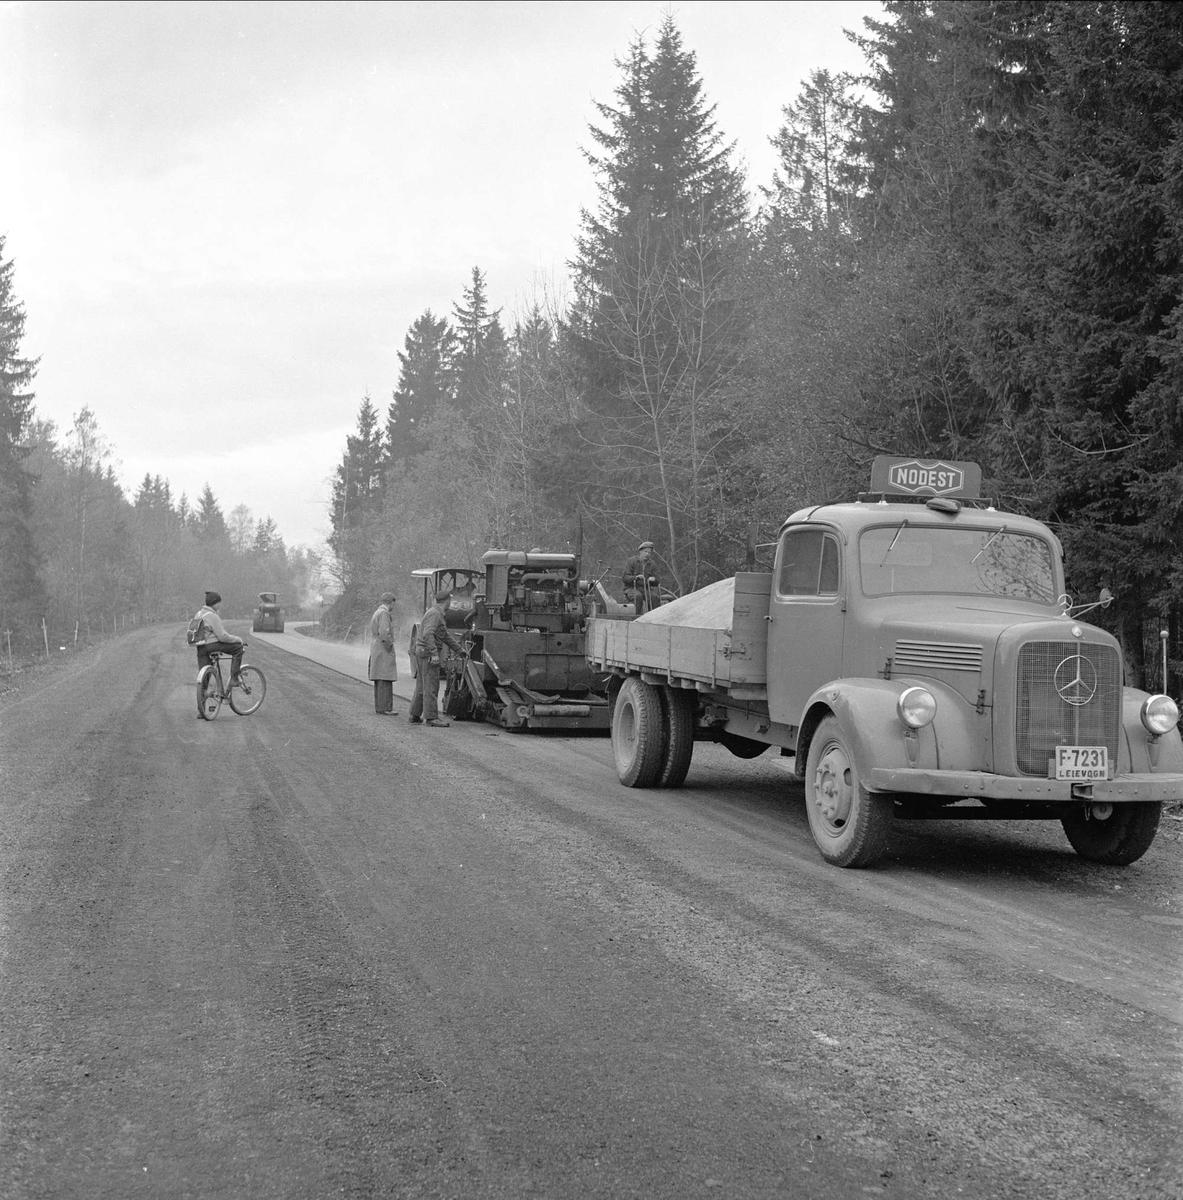 Drammensveien, Asker, Akershus, oktober 1958. Veibygging, asfaltering.